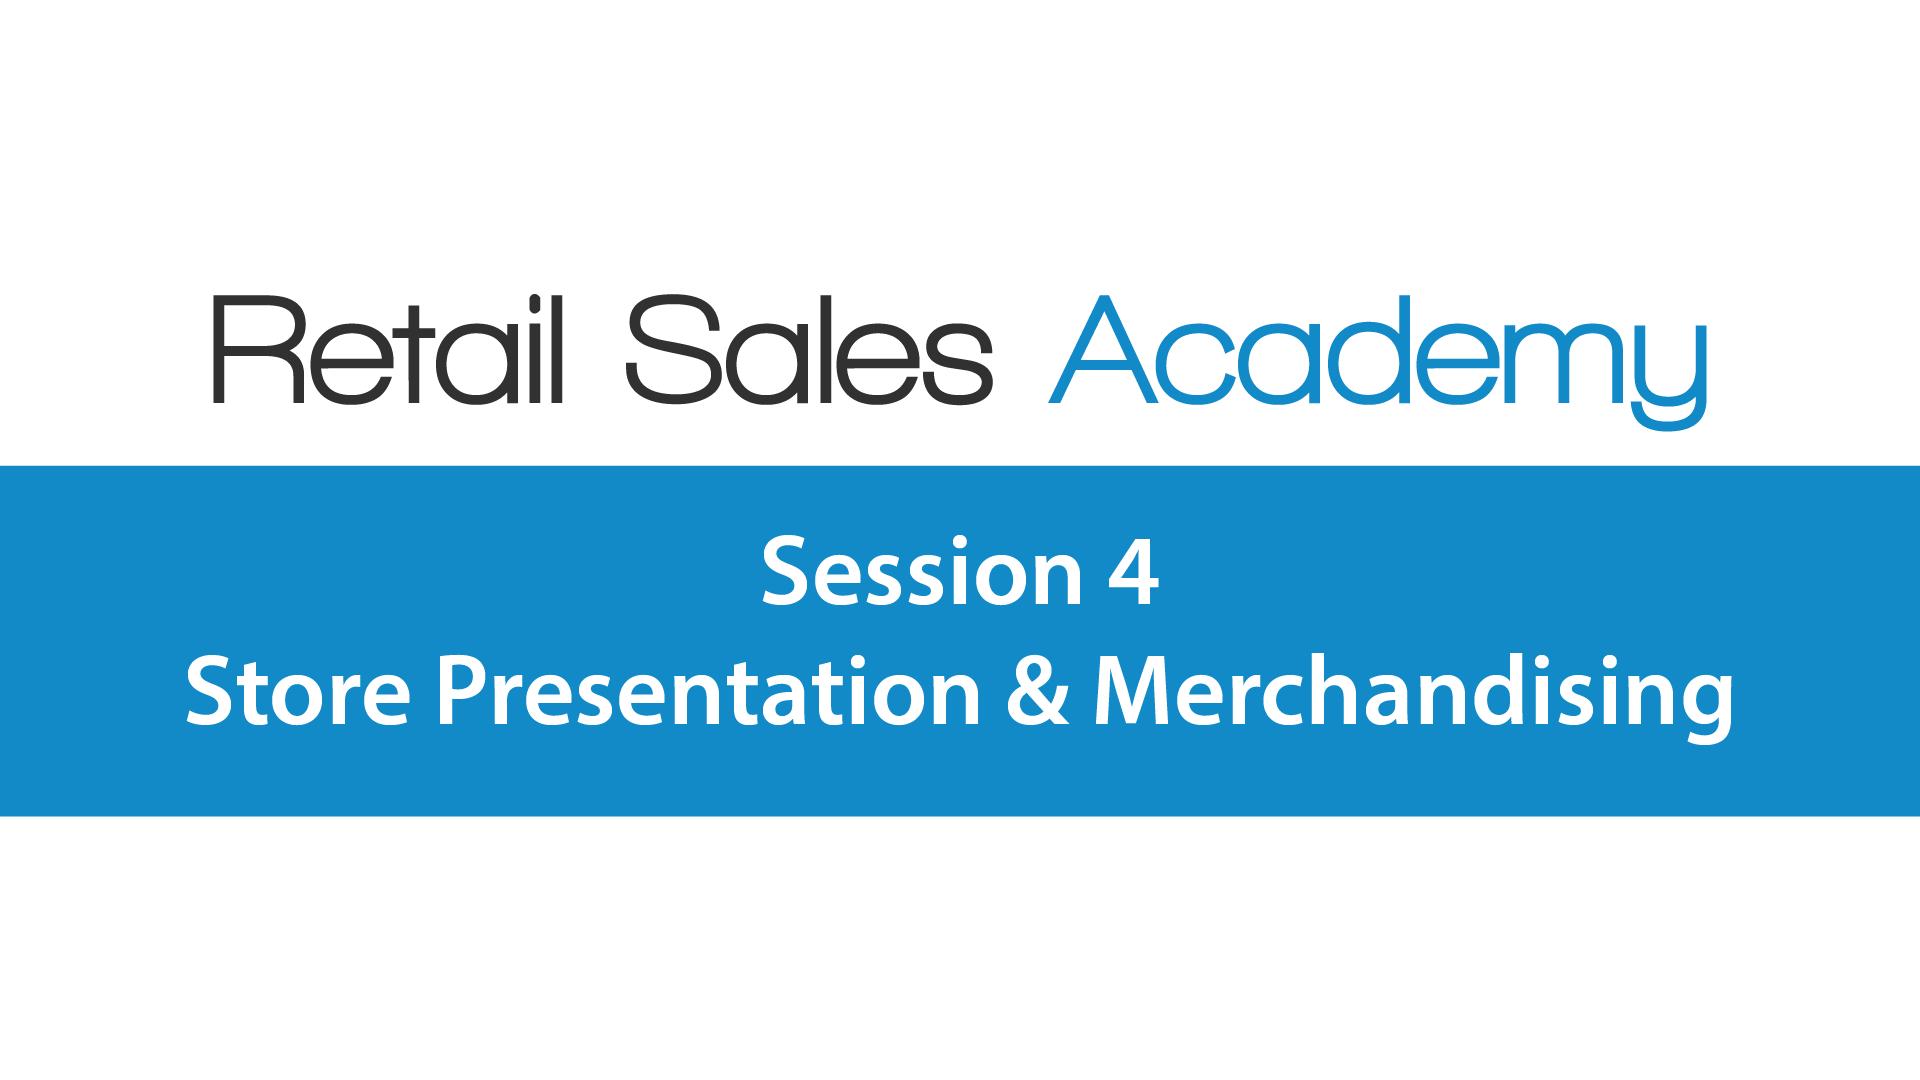 Store Presentation & Merchandising